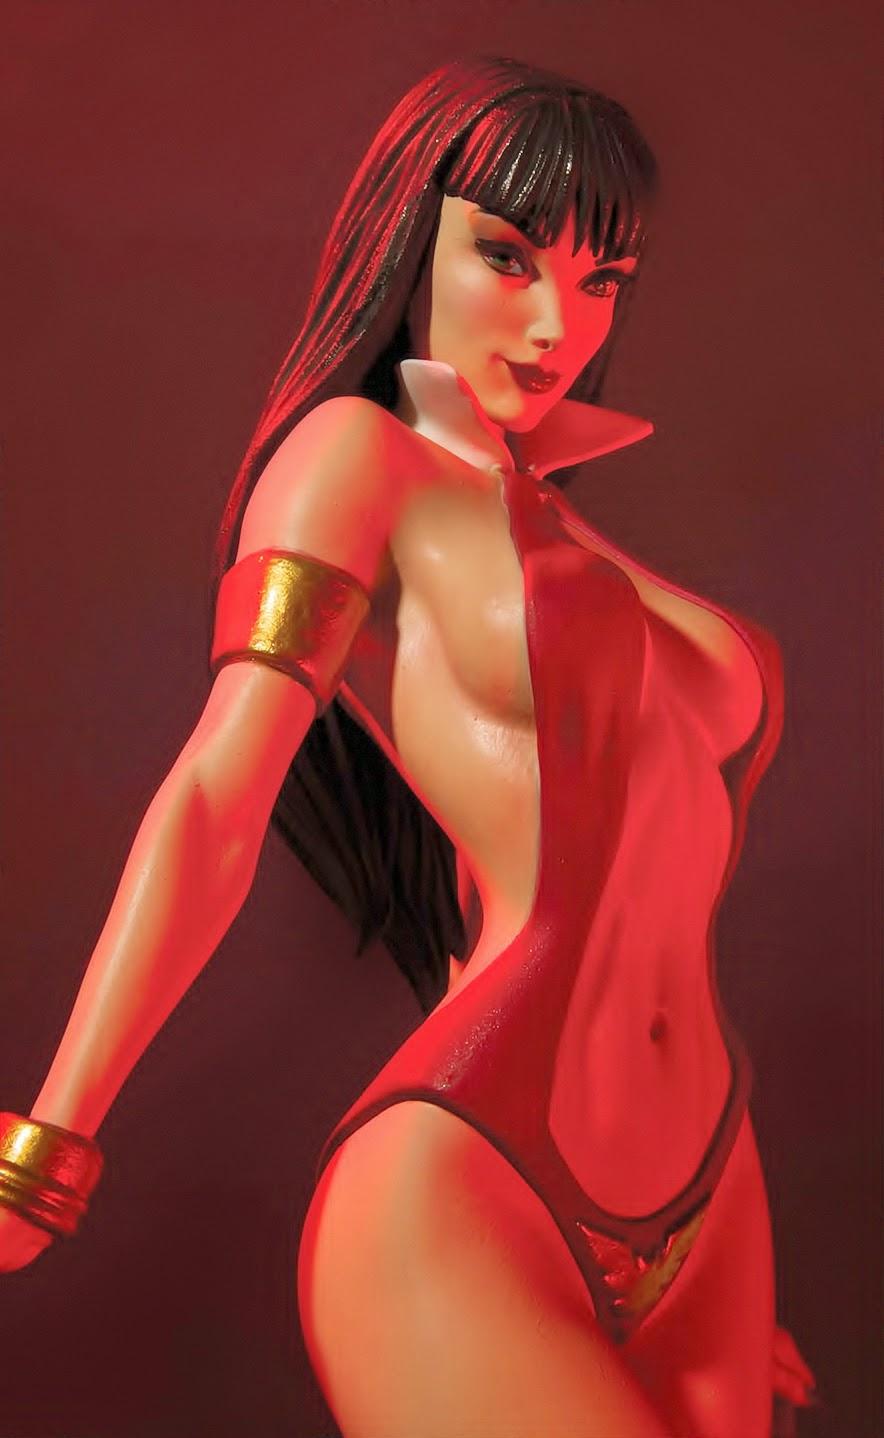 [Dynamite] Woman of Dynamite: Vampirella Statue Vamp_red%2Bfull